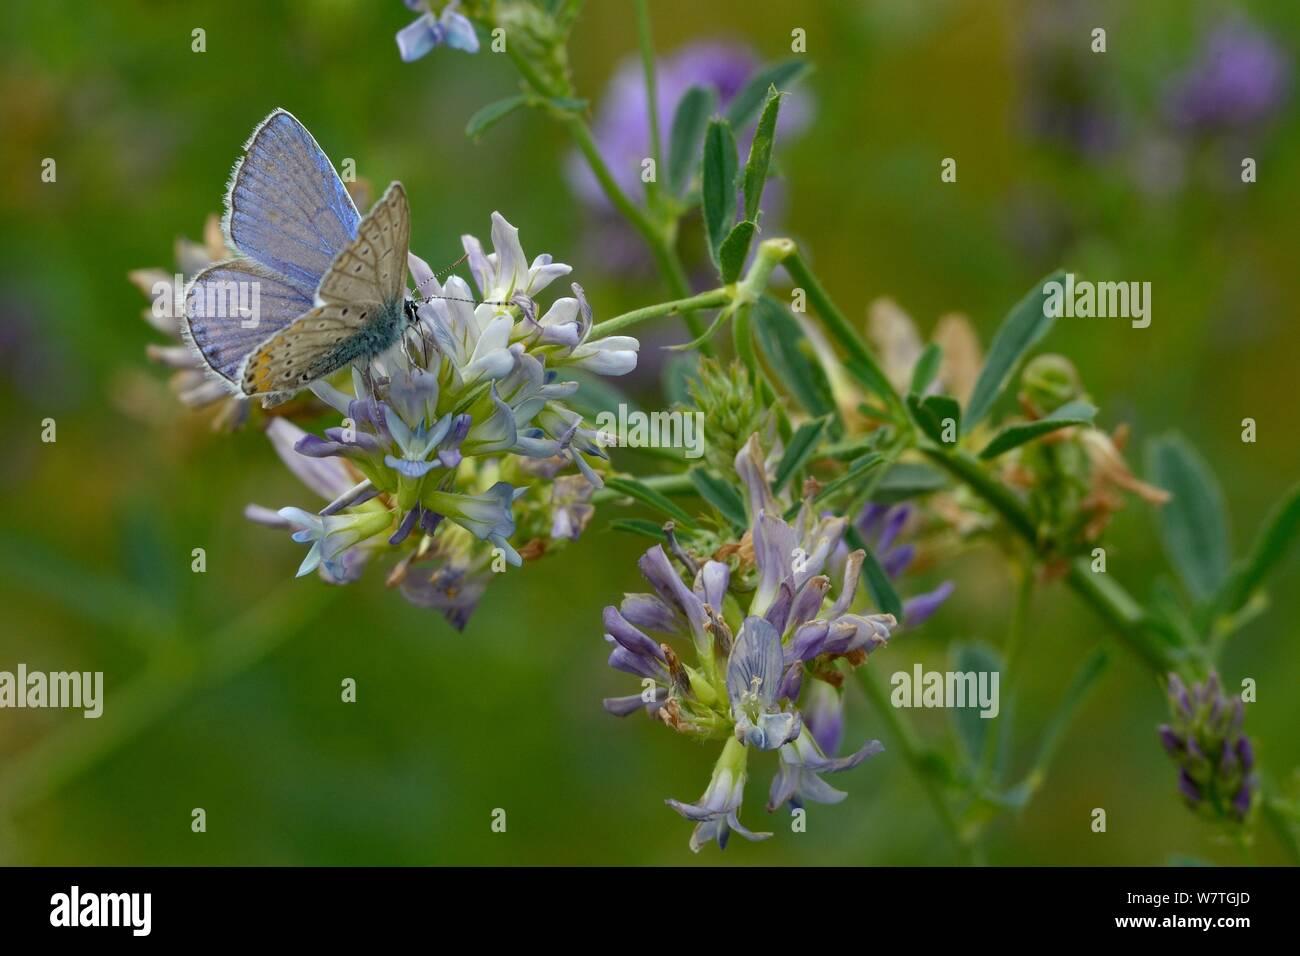 Mariposa Azul común (Polyommatus icarus) de alfalfa (Medicago sativa) Flor, Vendée, Francia, Julio. Foto de stock